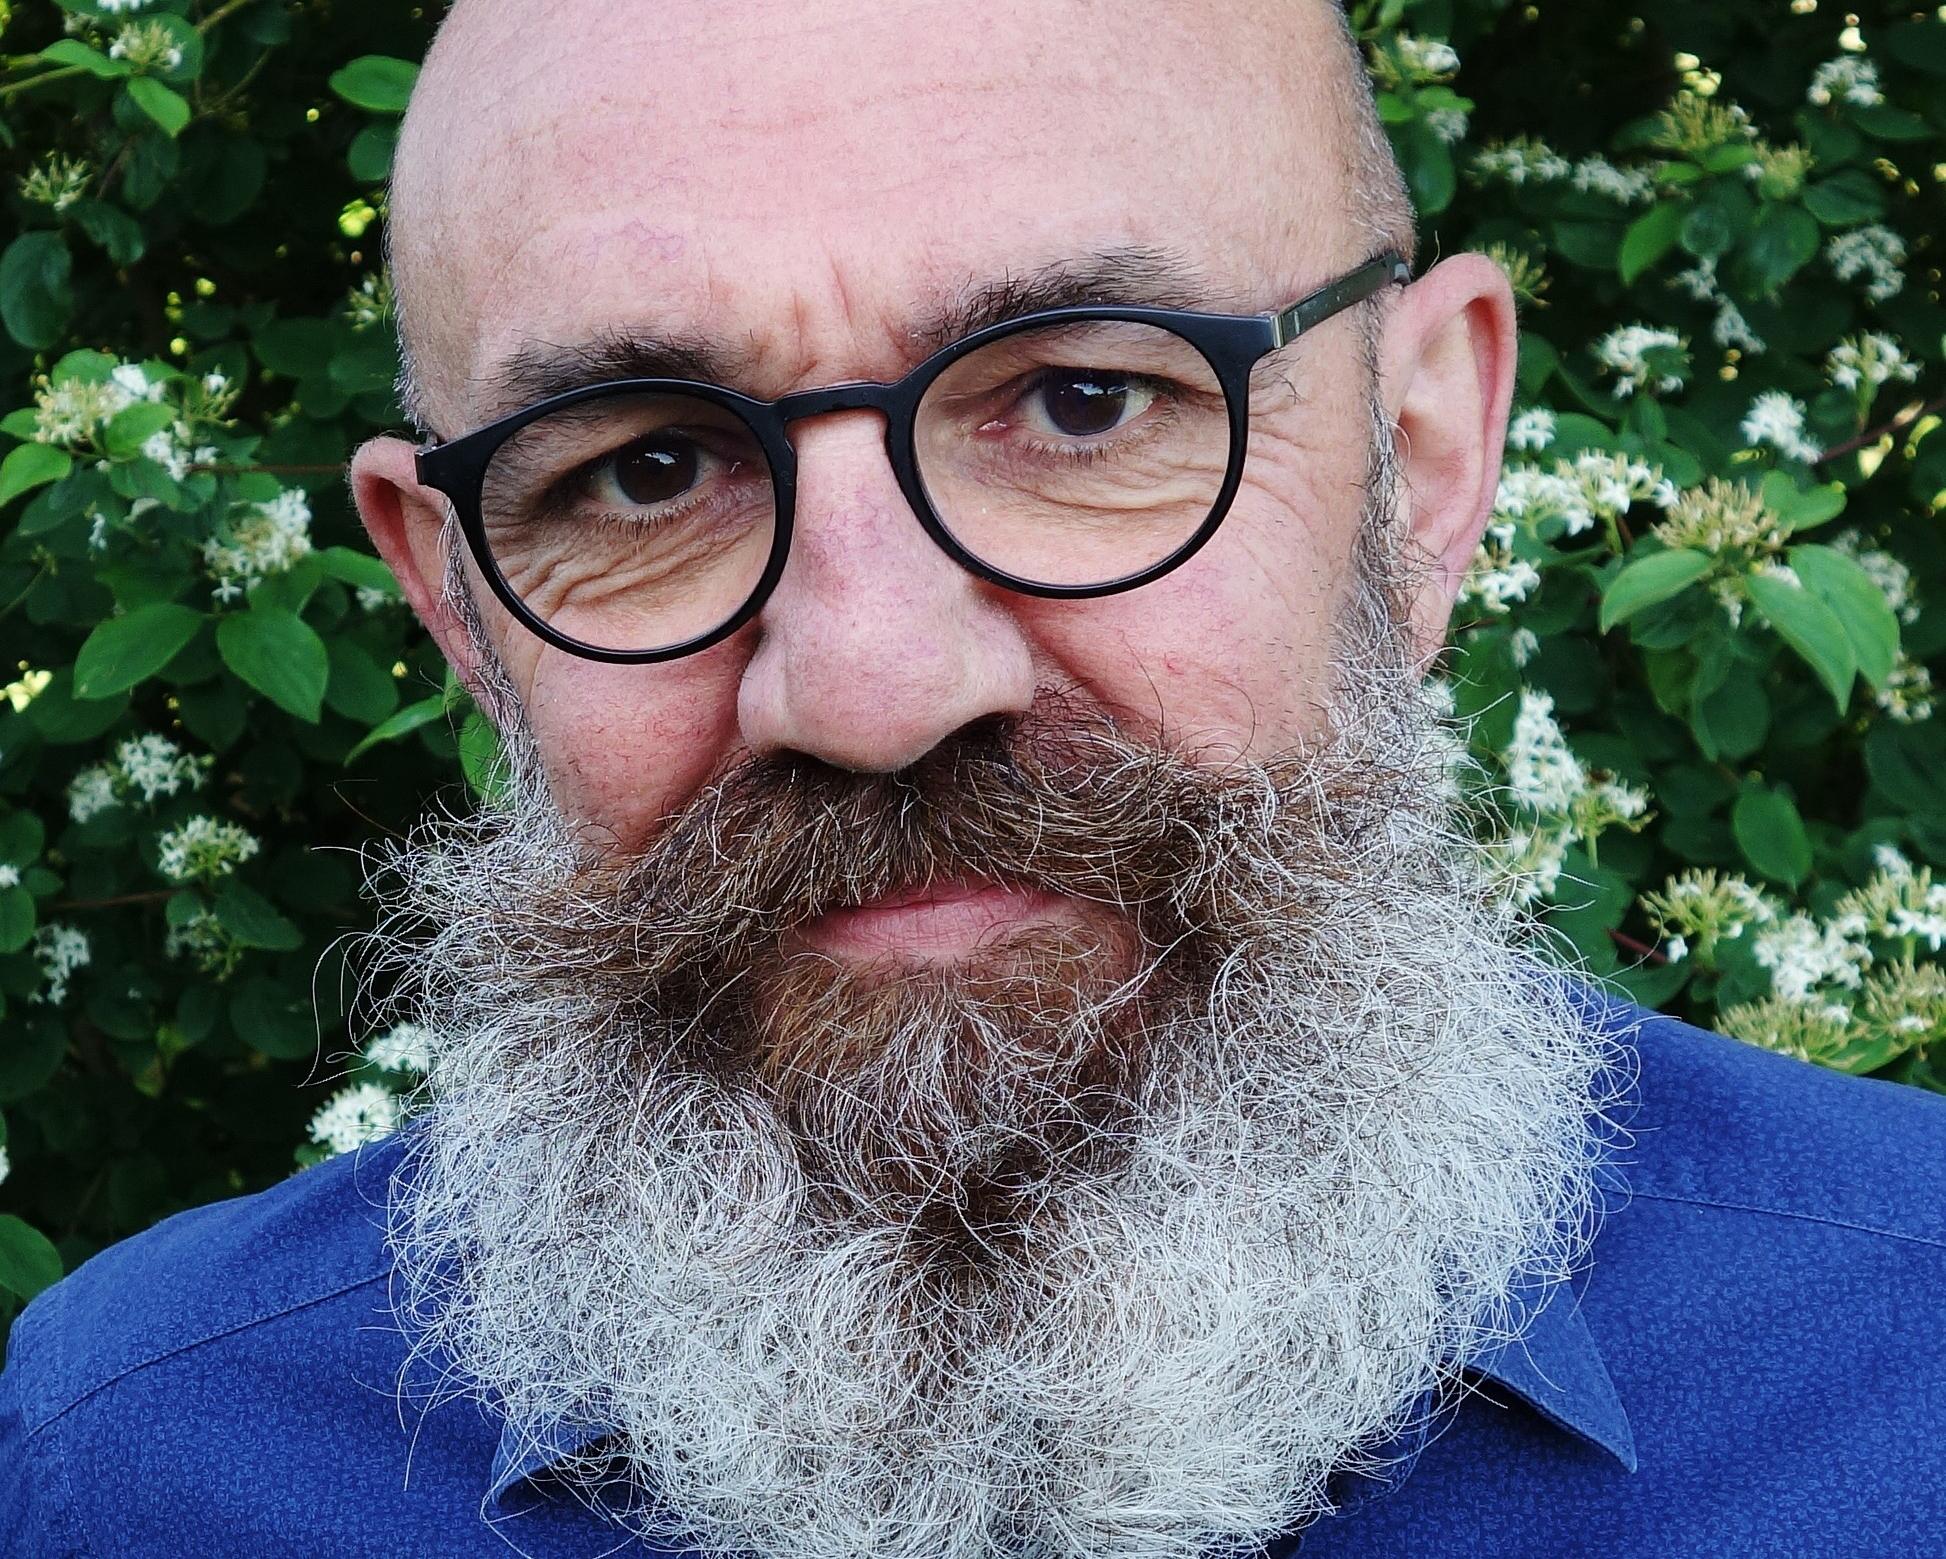 Verzachtende omstandigheden & De doden praten - José Maschelin (webcam)